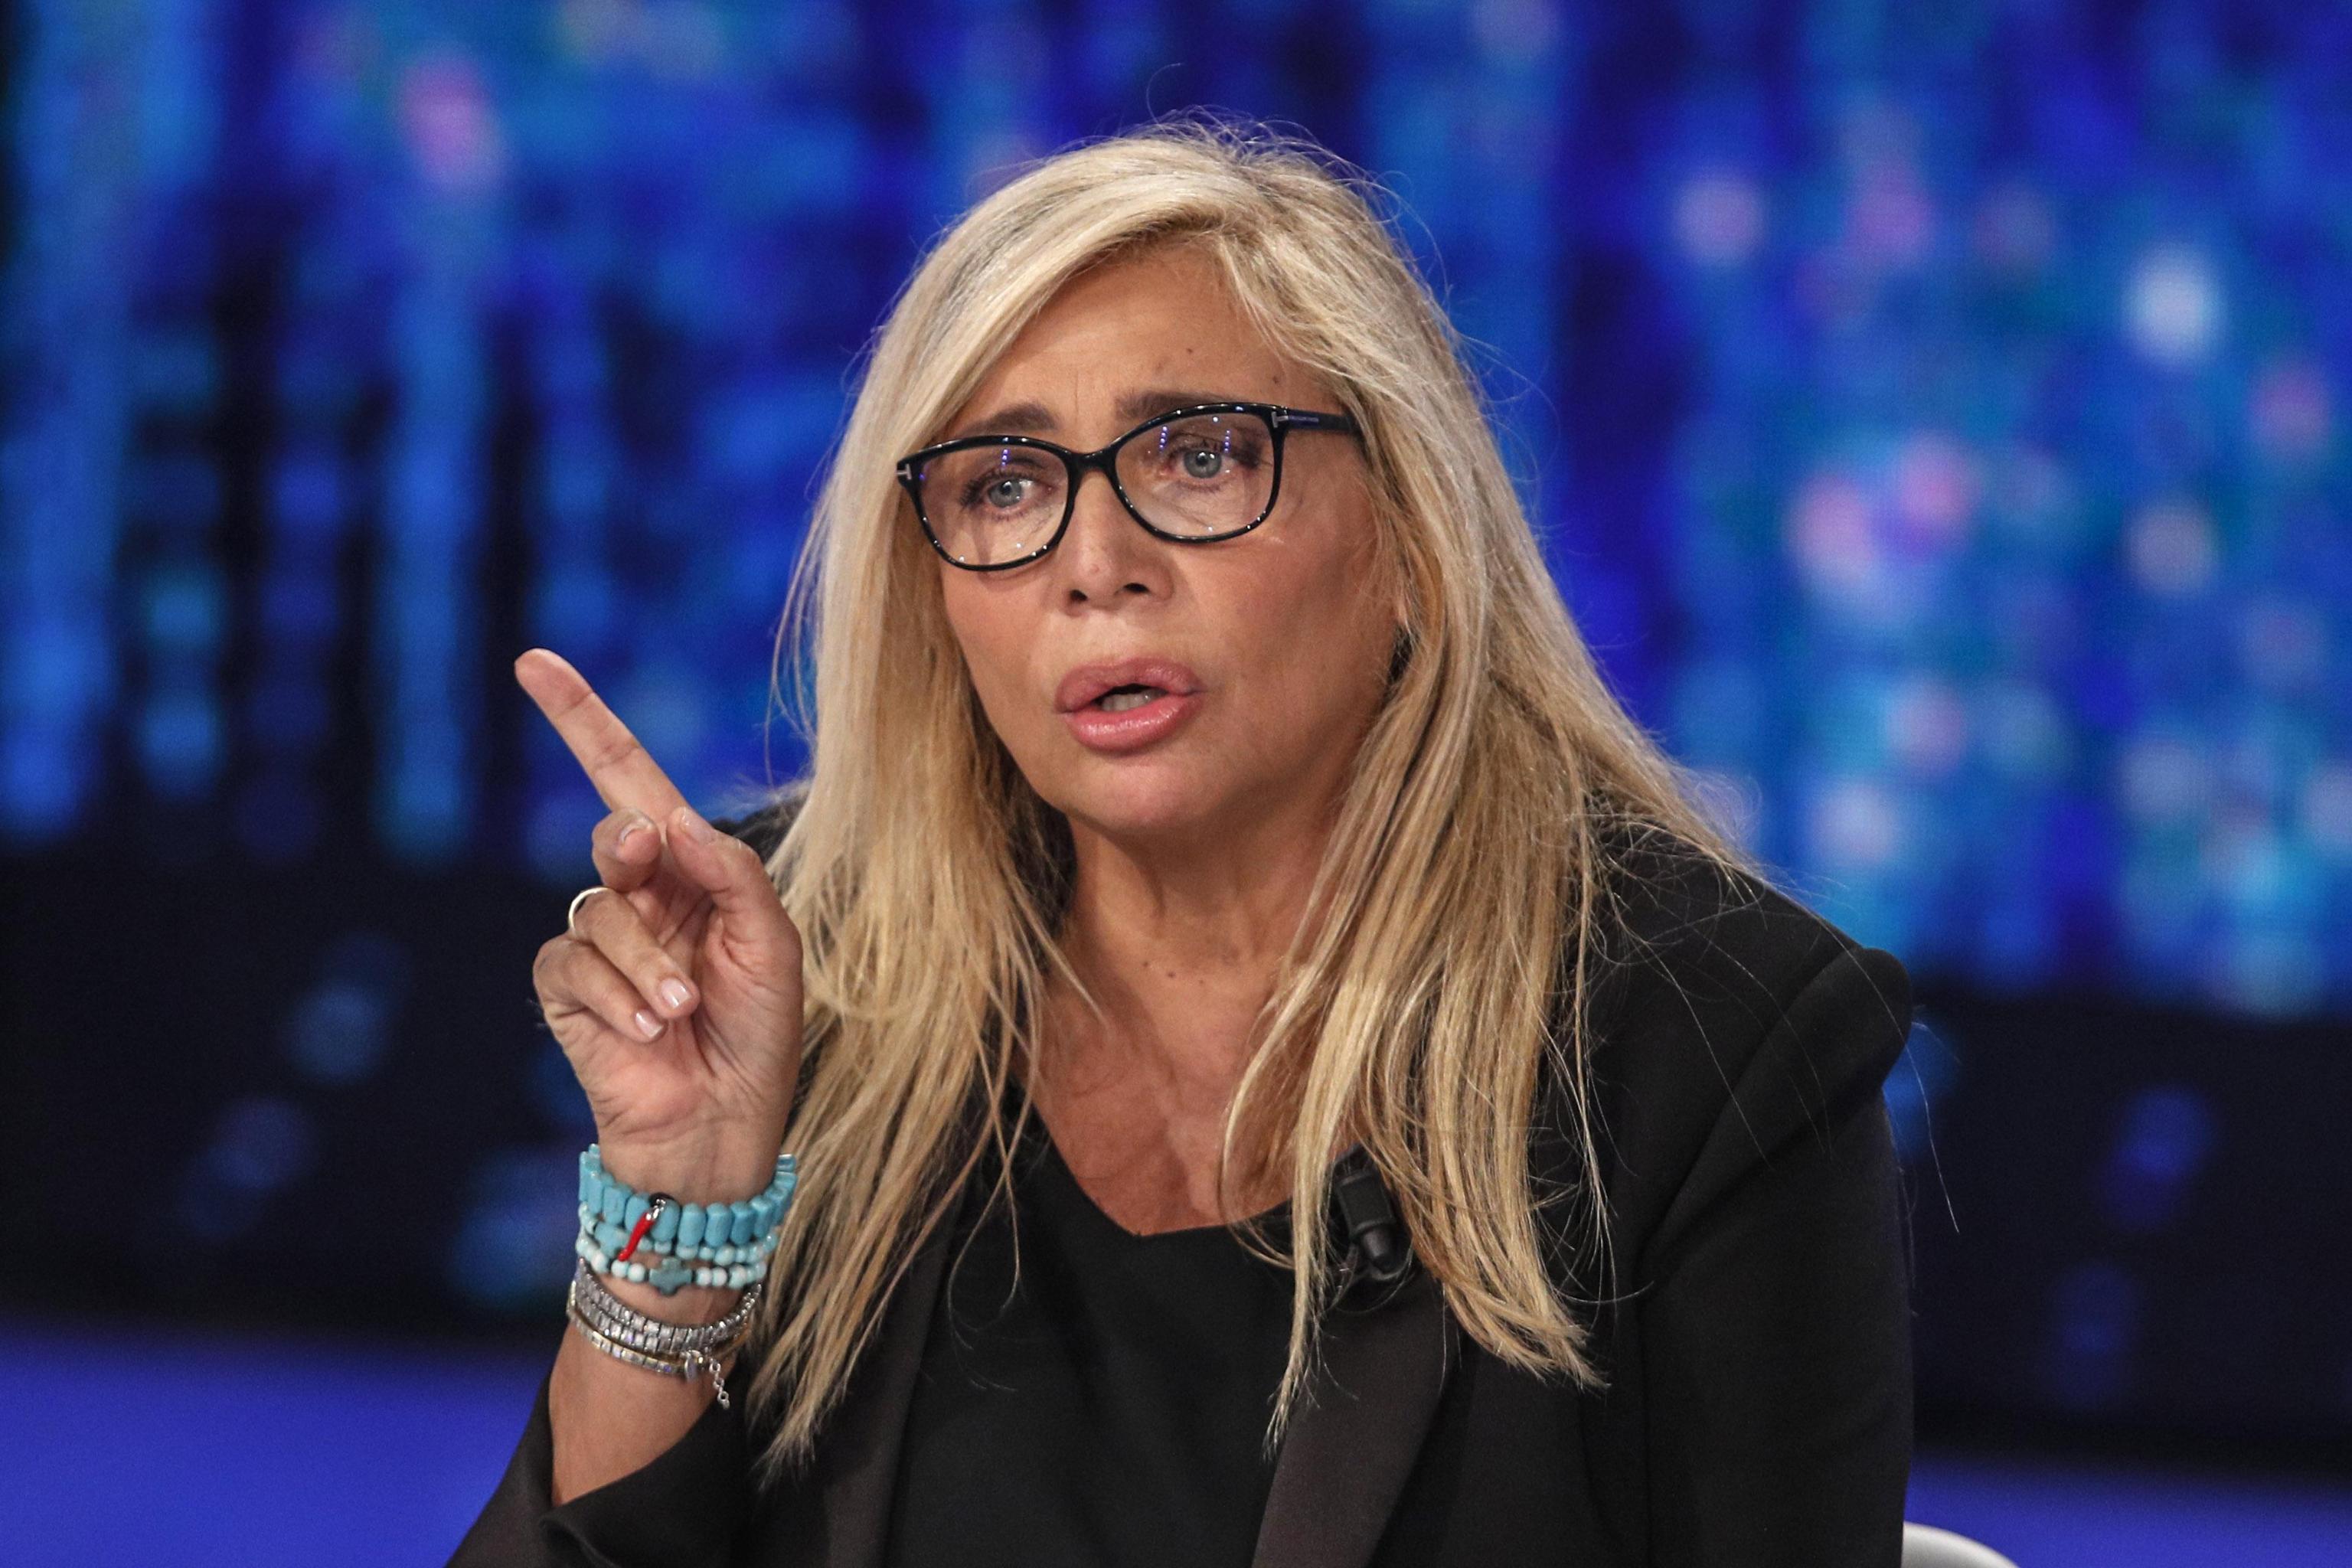 Mara Venier saluta in diretta l'attentatore di Togliatti, bufera sulla conduttrice